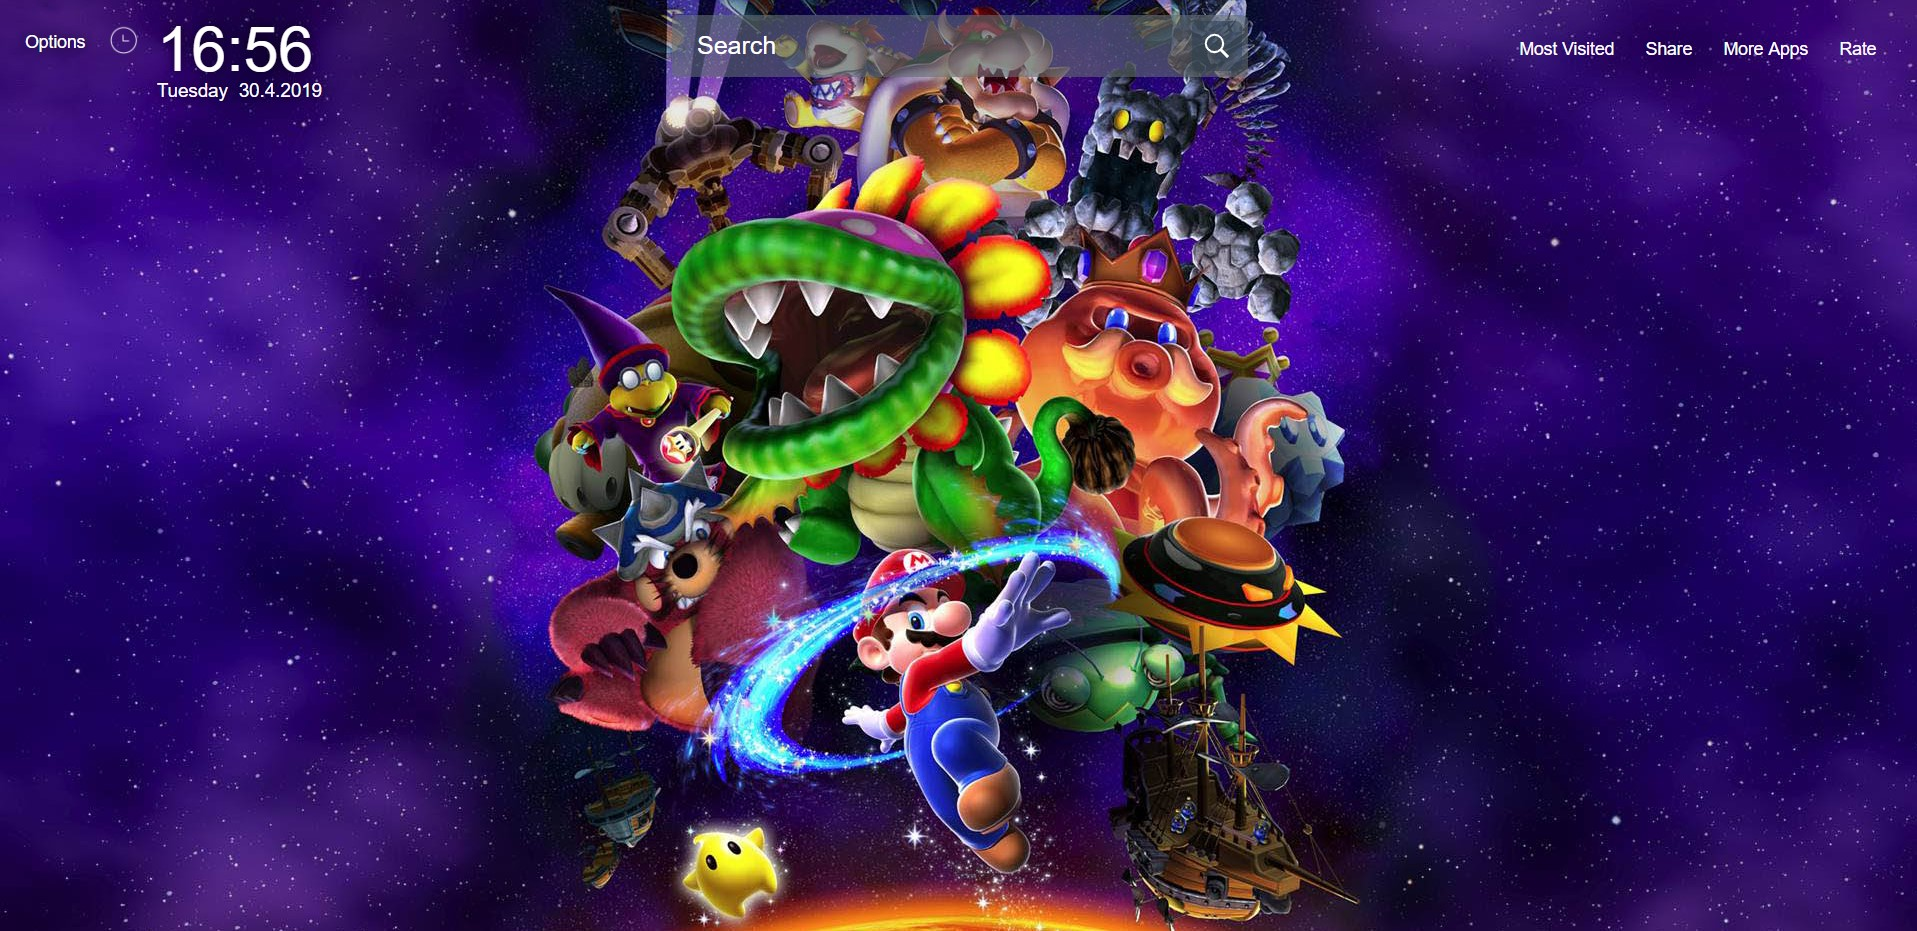 Nintendo Game Wallpapers HD New Tab Theme - chrome ...